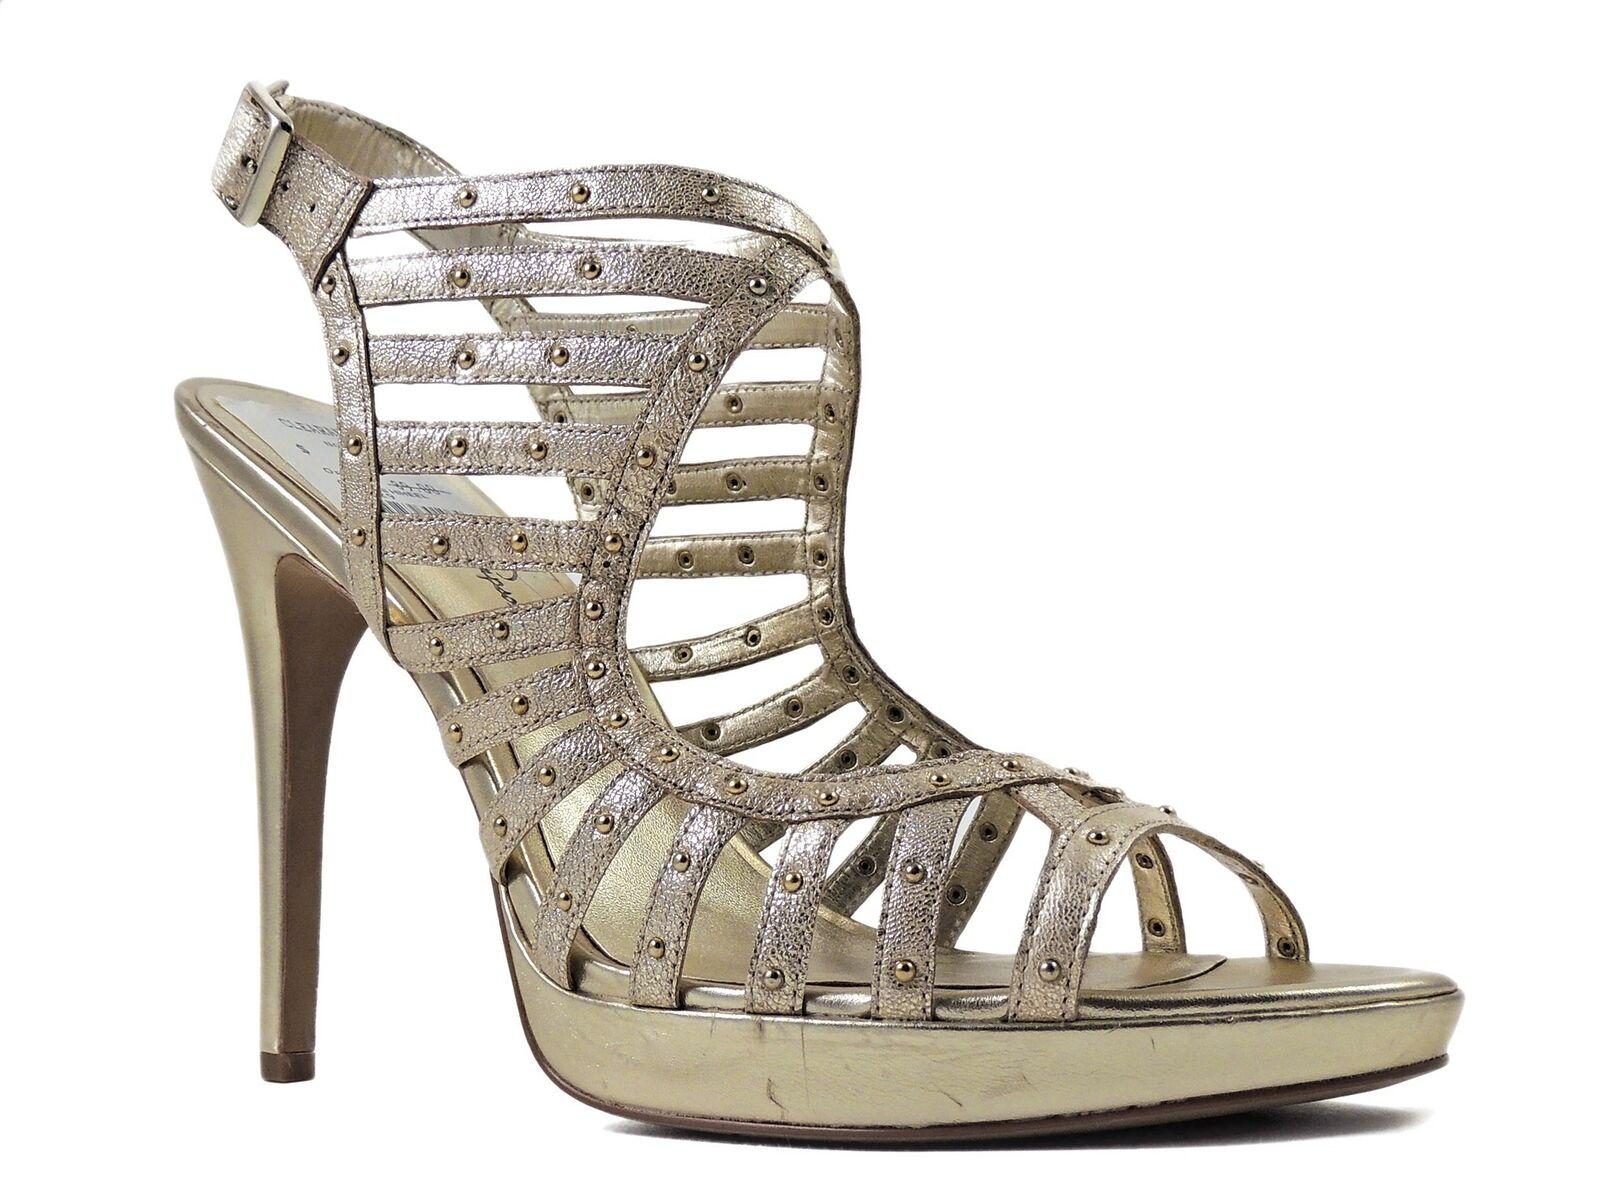 Jessica Simpson Women's Cesarini Platform Sandals Platinum Rock Dave Size 10 M